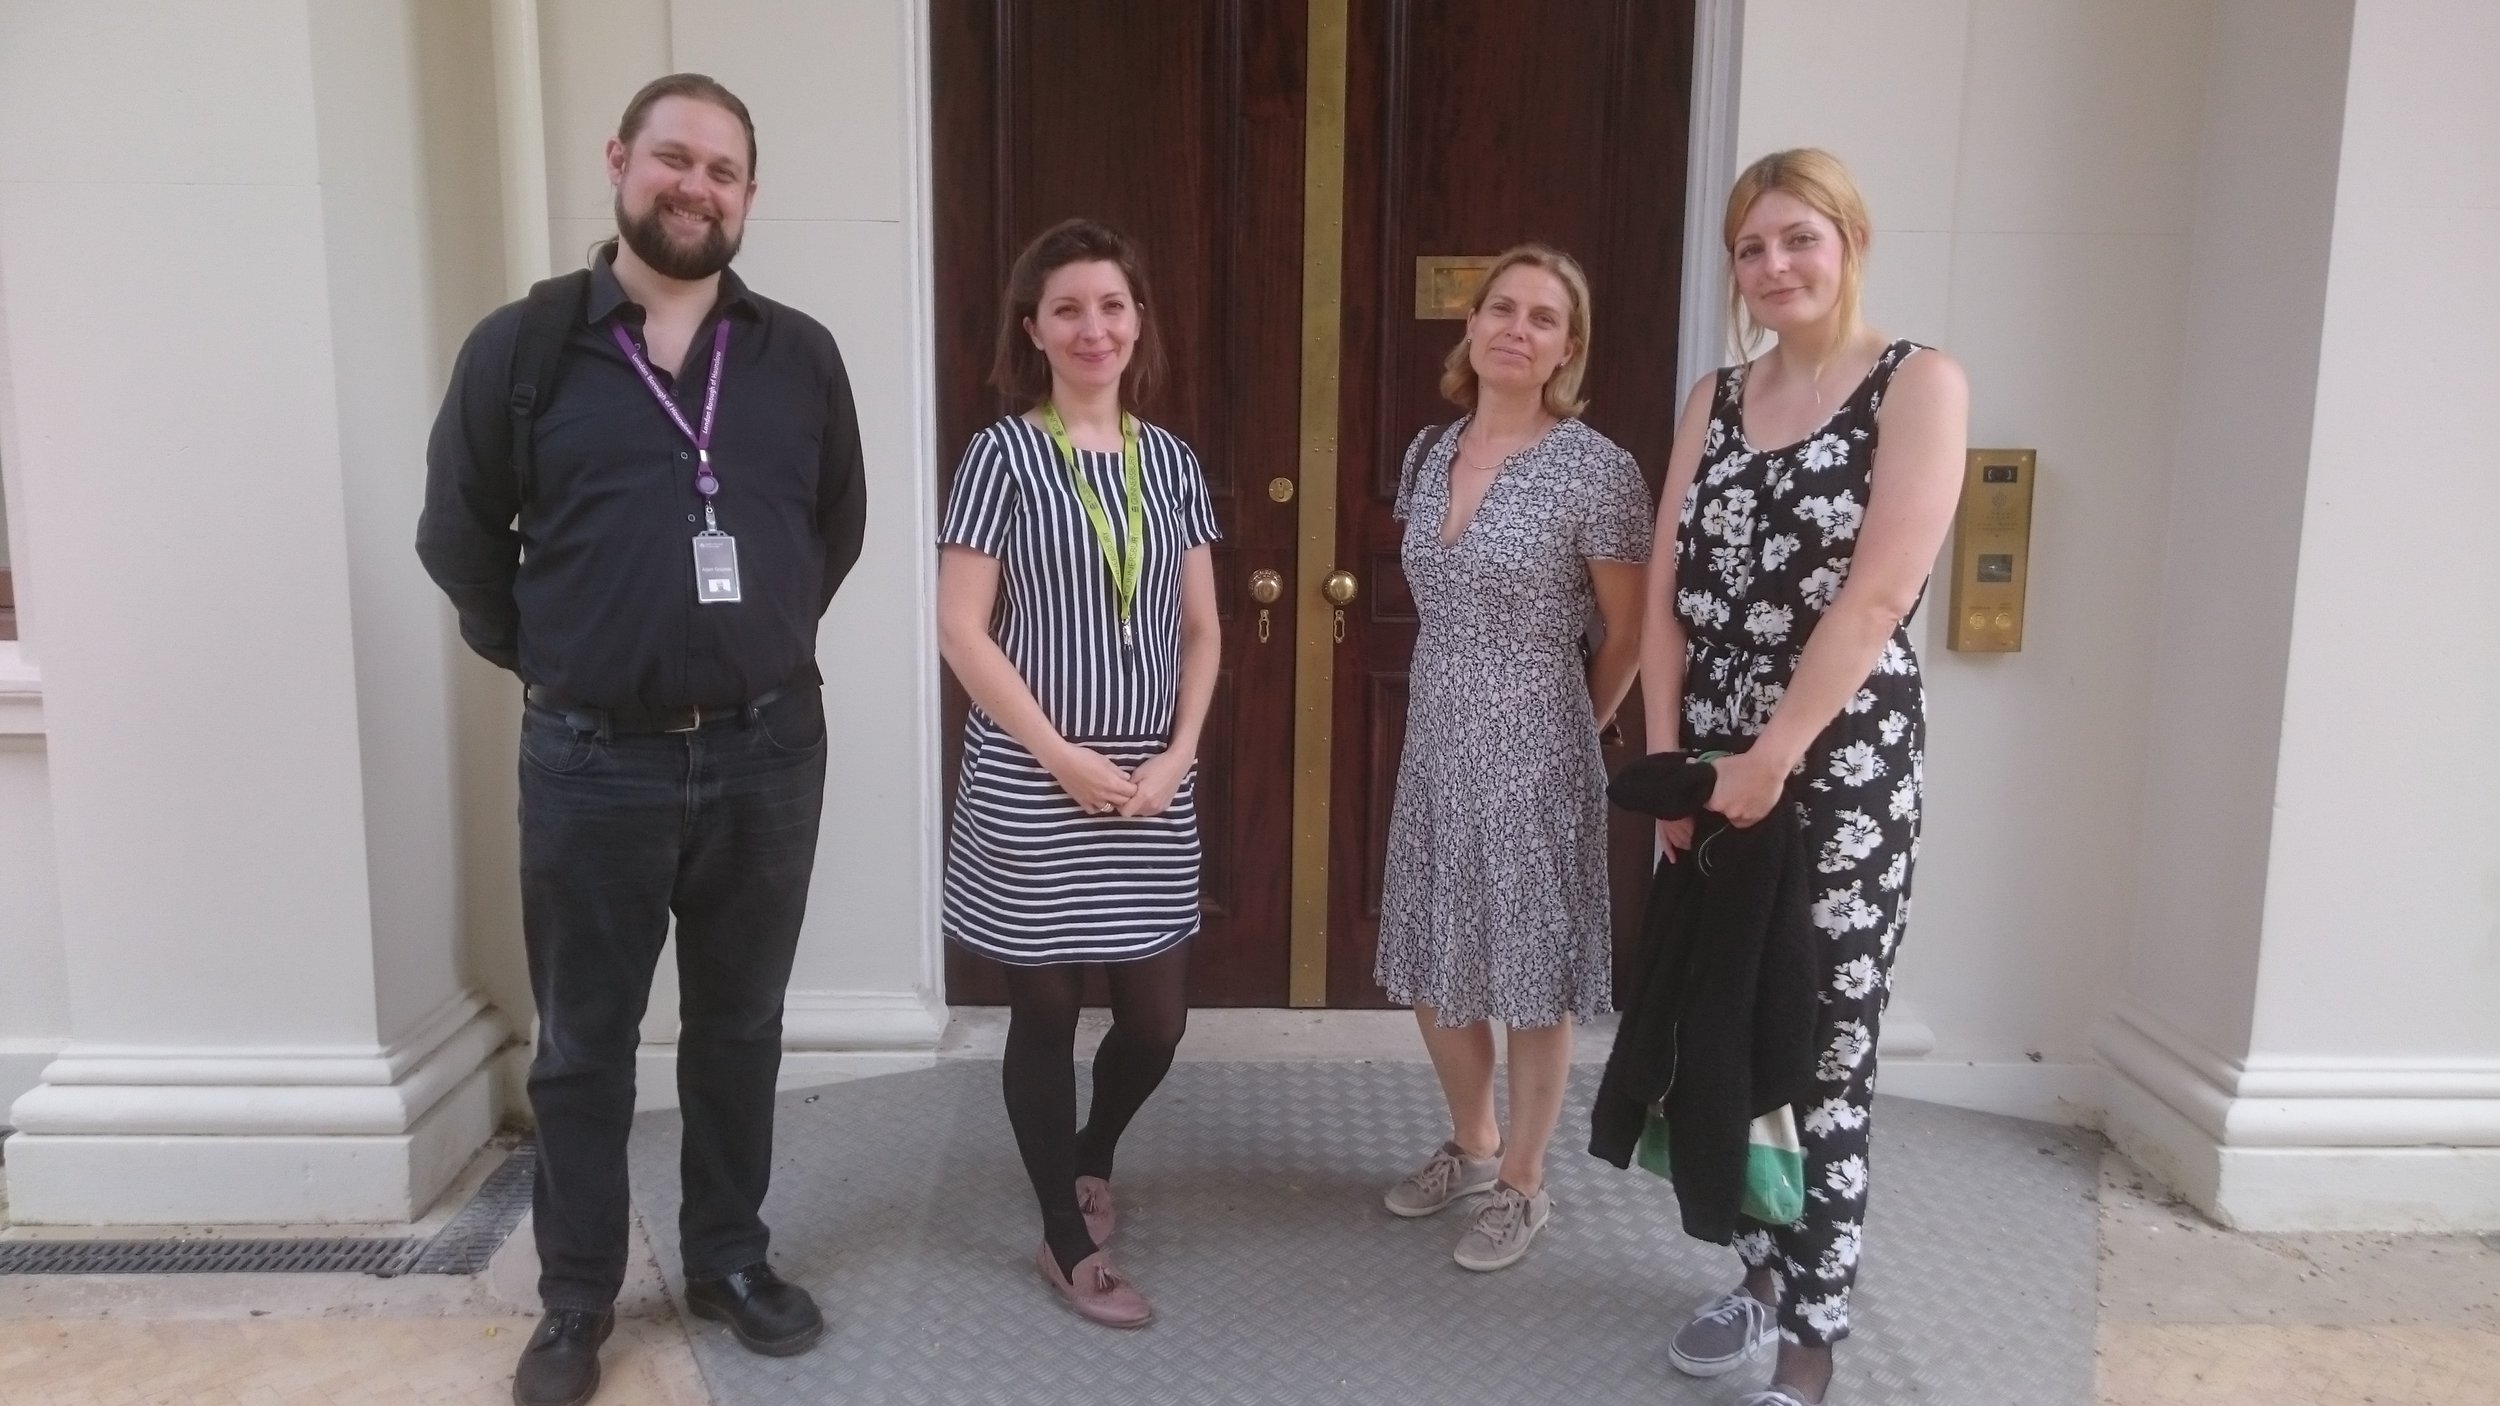 Partner and Volunteer Meeting at Gunnersbury Park and Museum